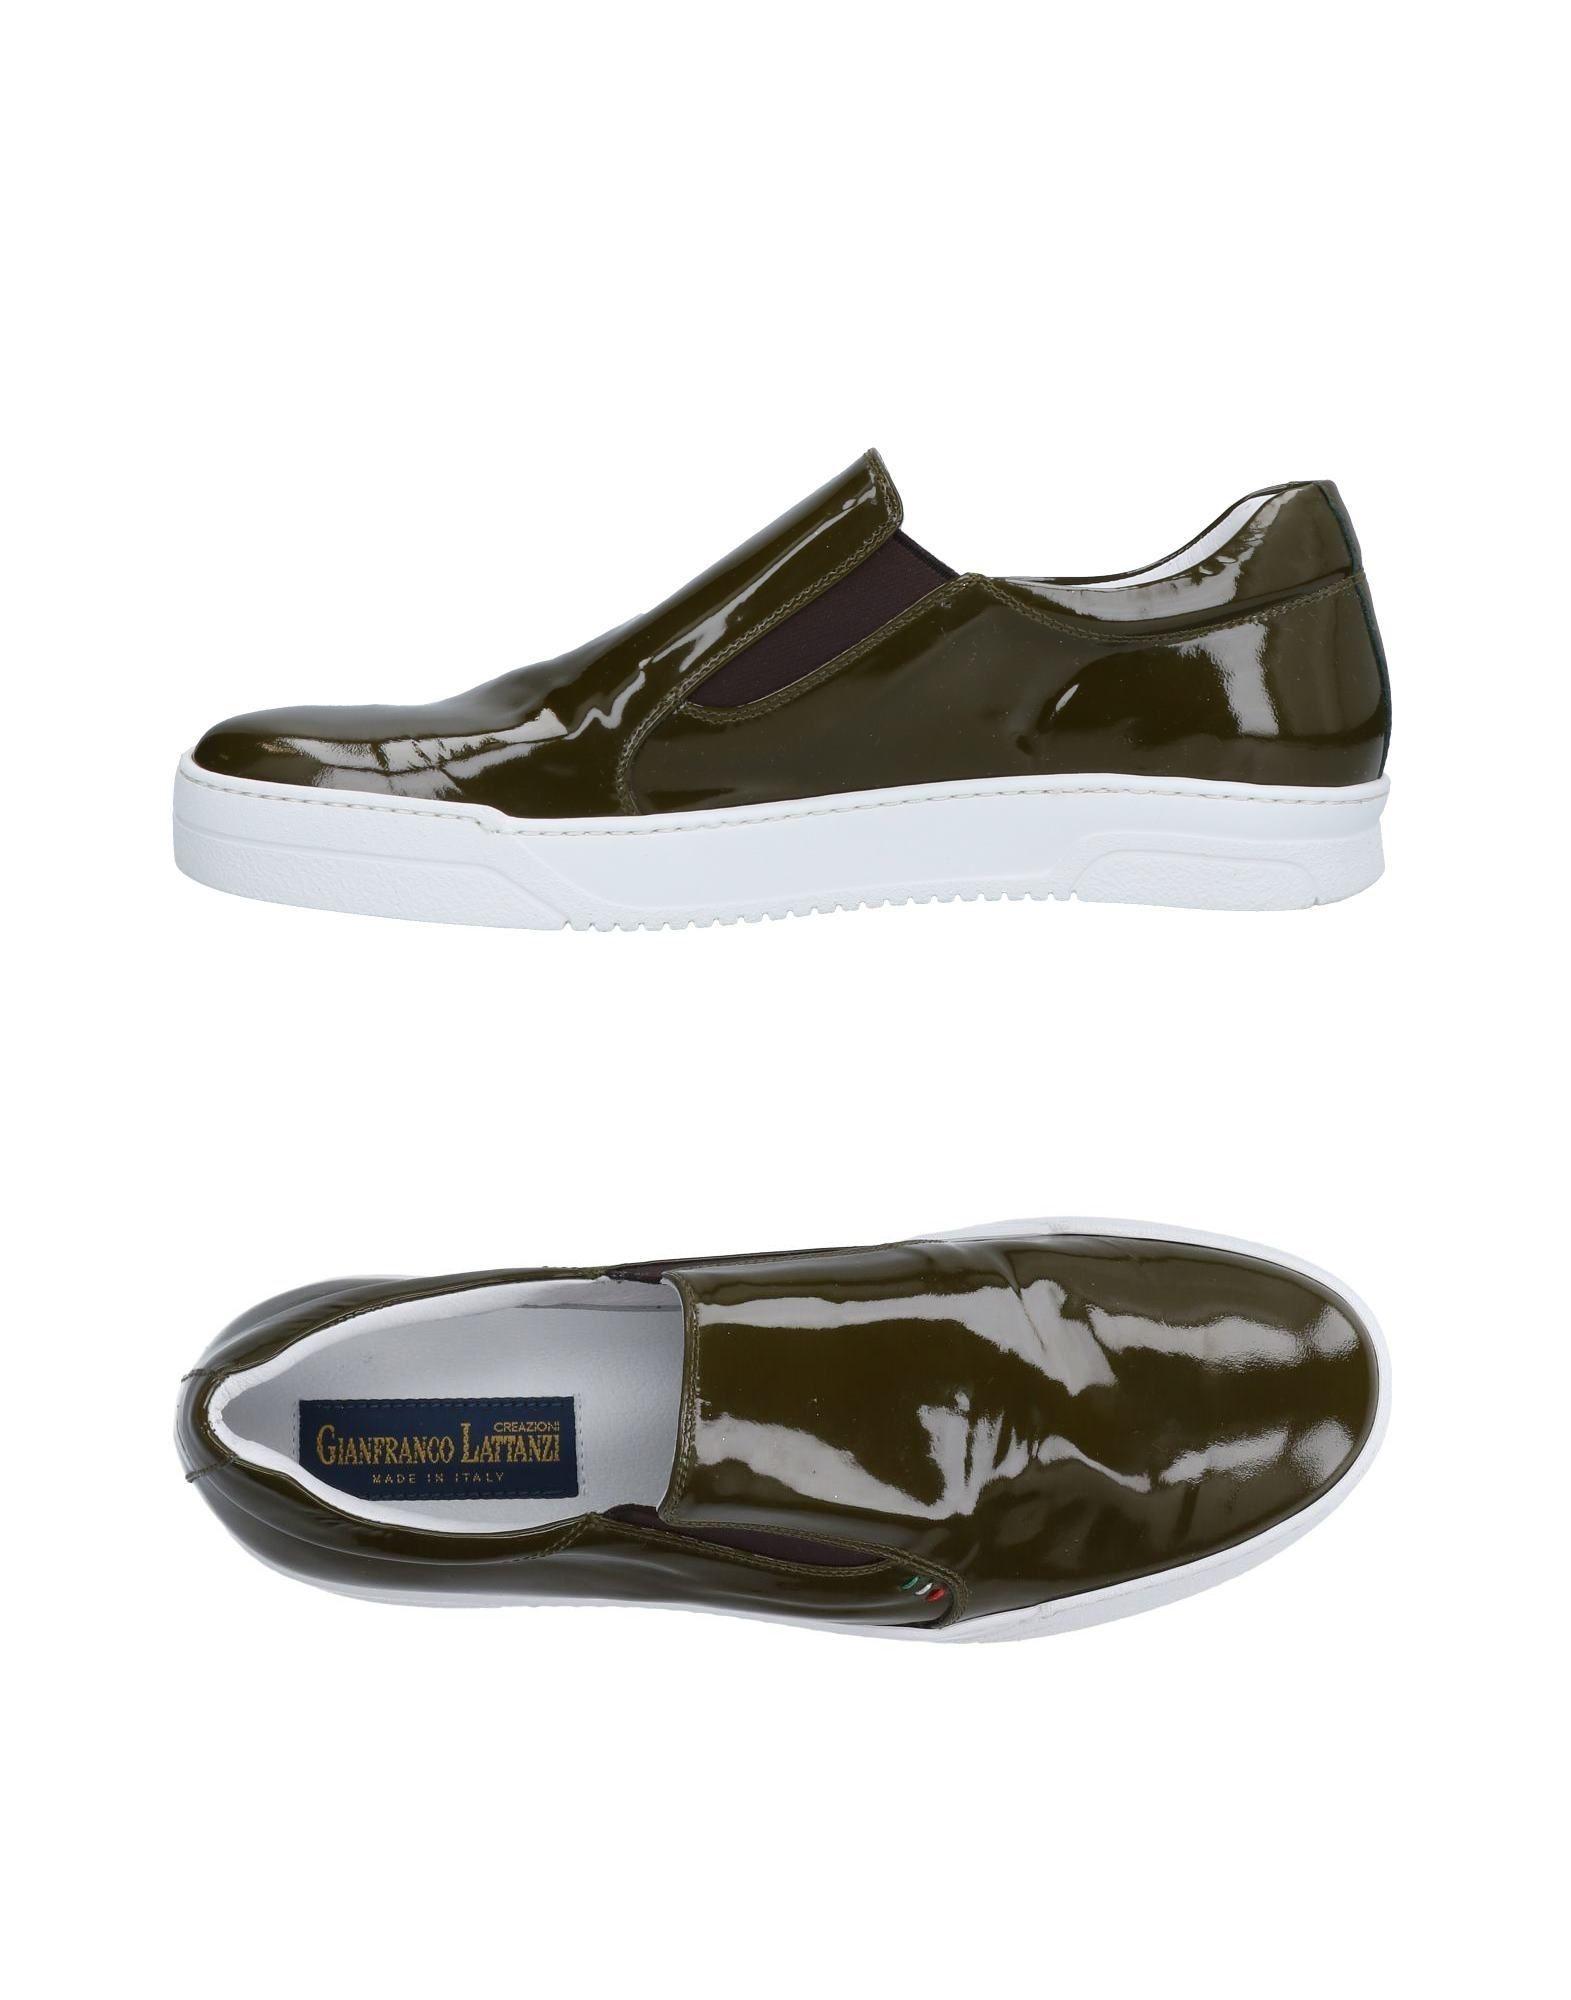 Gianfranco Lattanzi Sneakers Herren  11512409RM Gute Qualität beliebte Schuhe